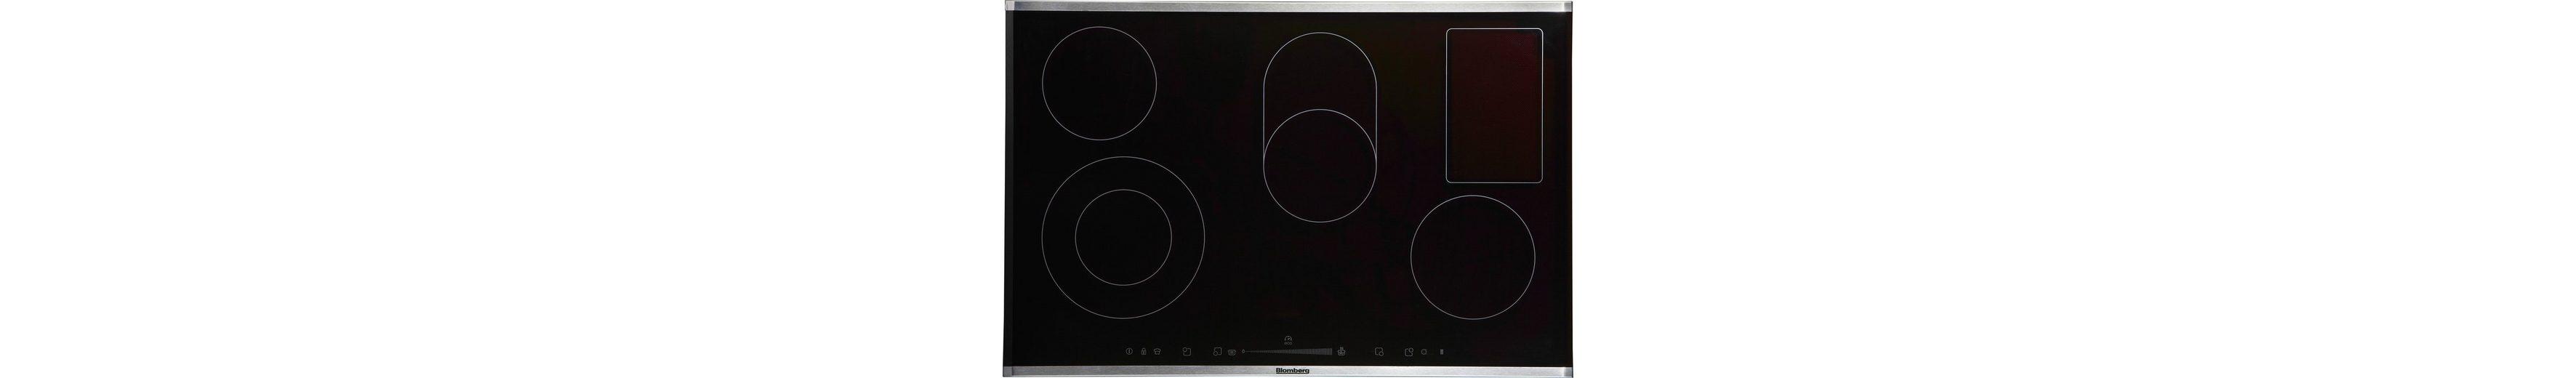 Blomberg Glaskeramik-Kochfeld MKX 74432 X